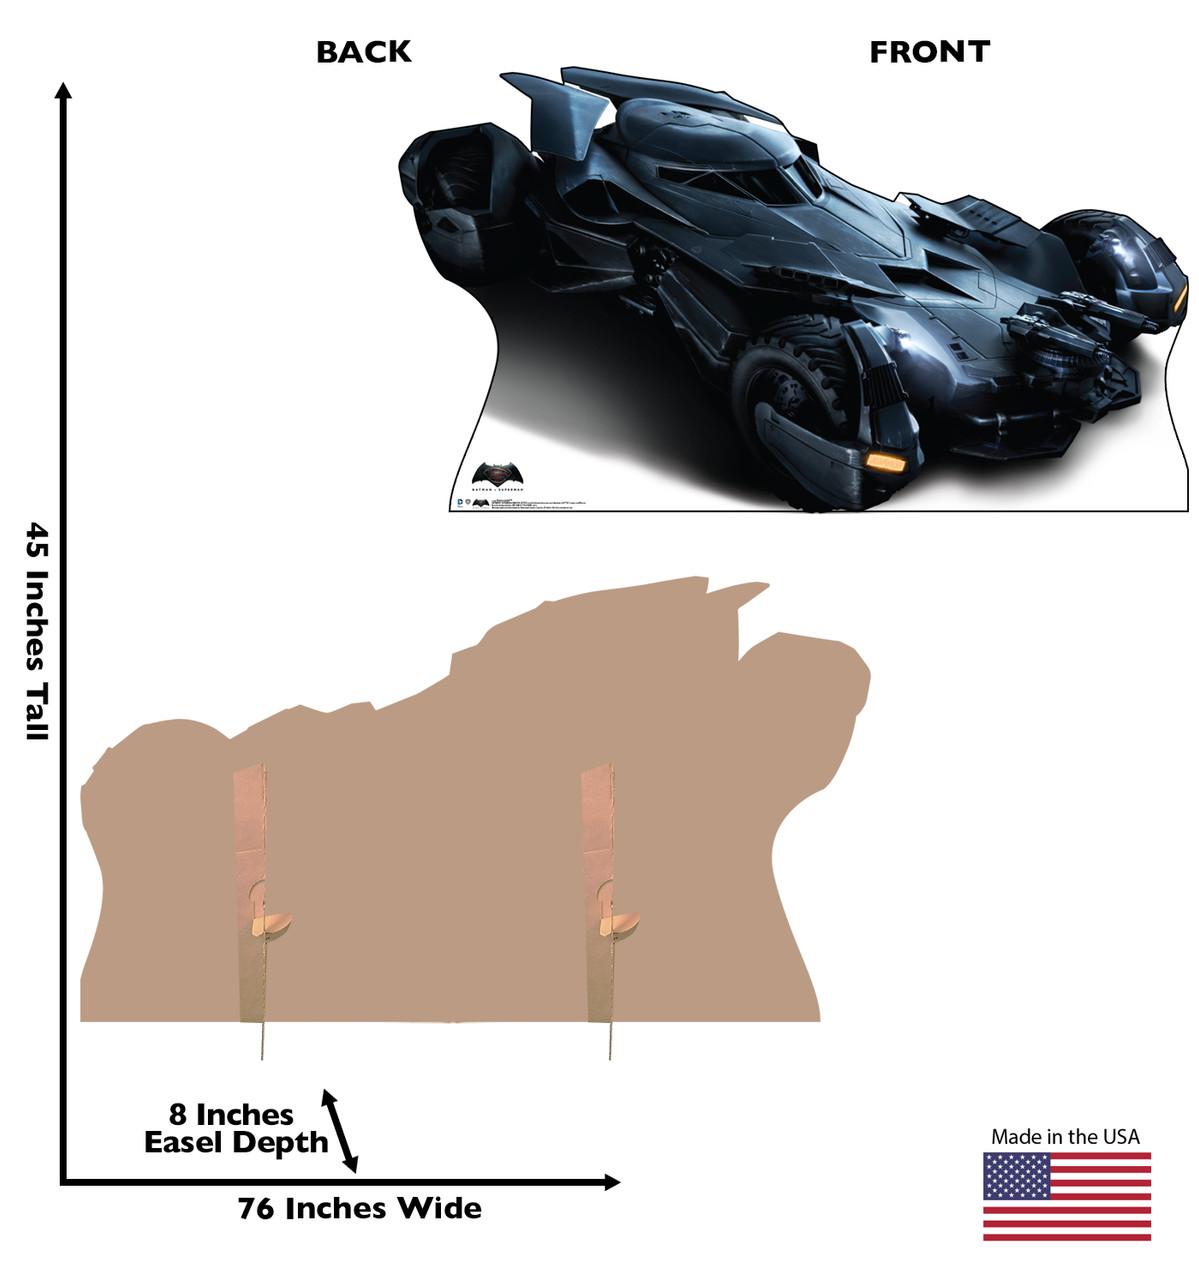 Batmobile - Batman V. Superman - Cardboard Cutout 2128